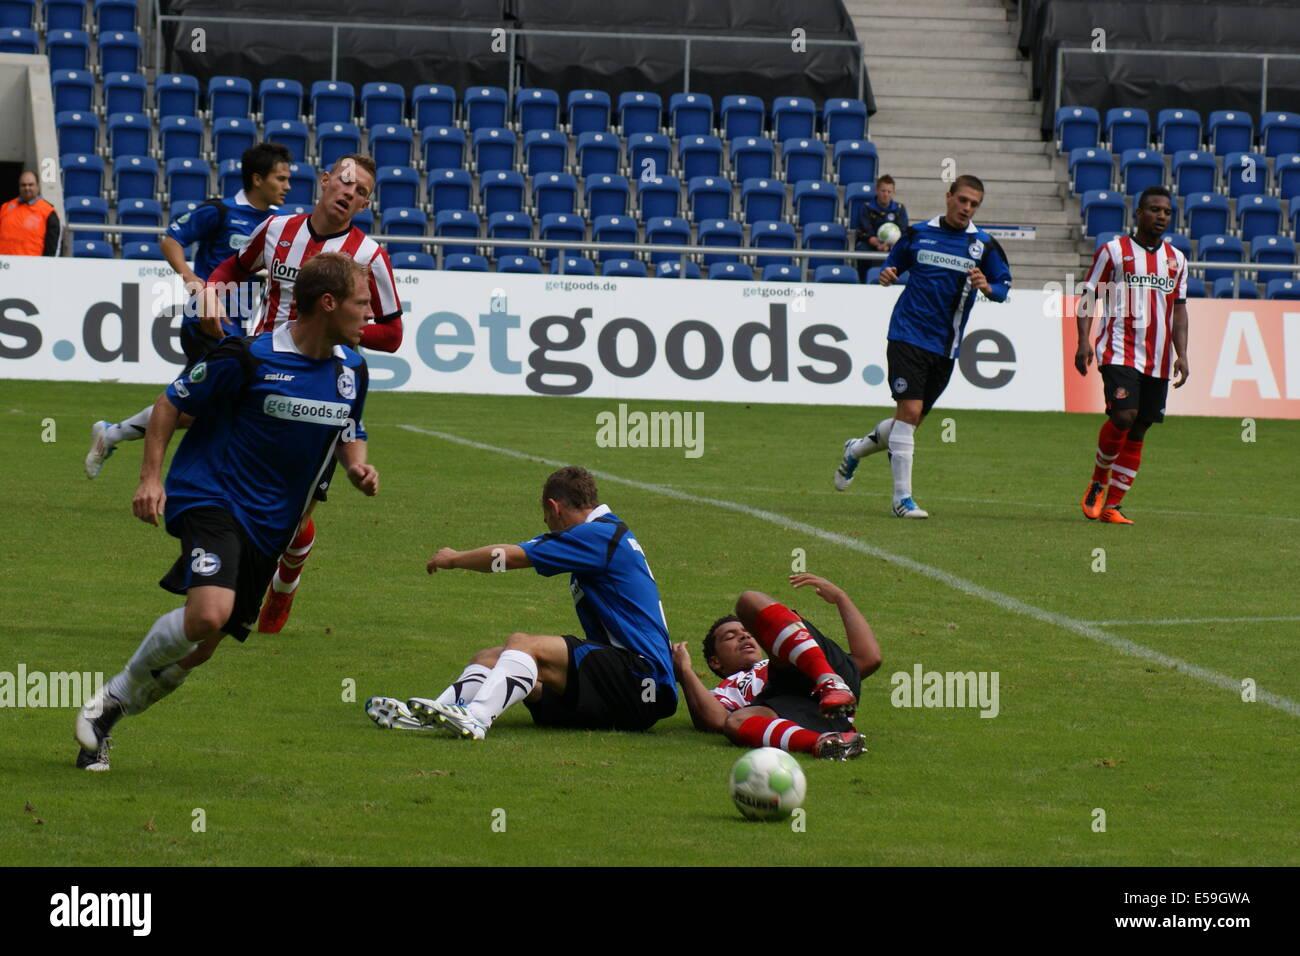 Arminia Bielefeld 1 Sunderland AFC 1 Schüco Arena (Bielefelder Alm)  Sunday 16th July 2011 - Stock Image